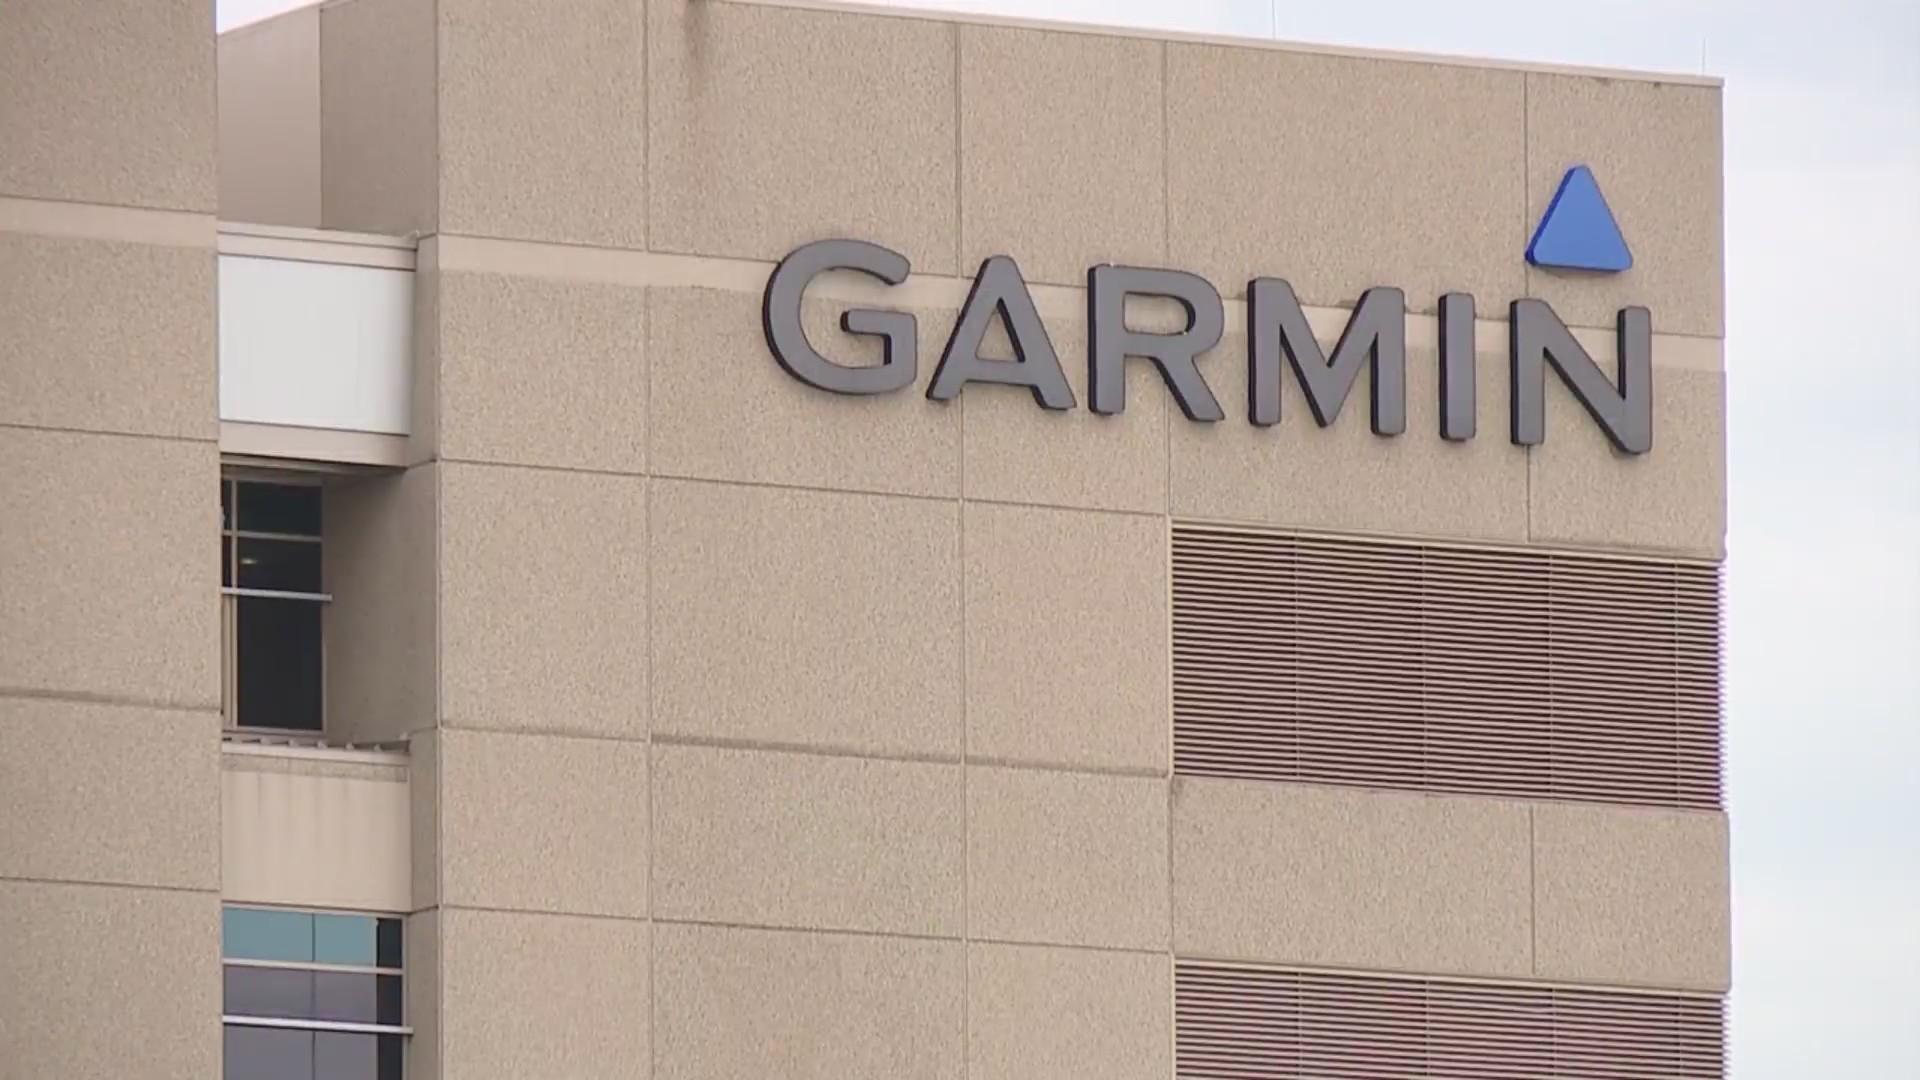 Garmin headquarters Olathe